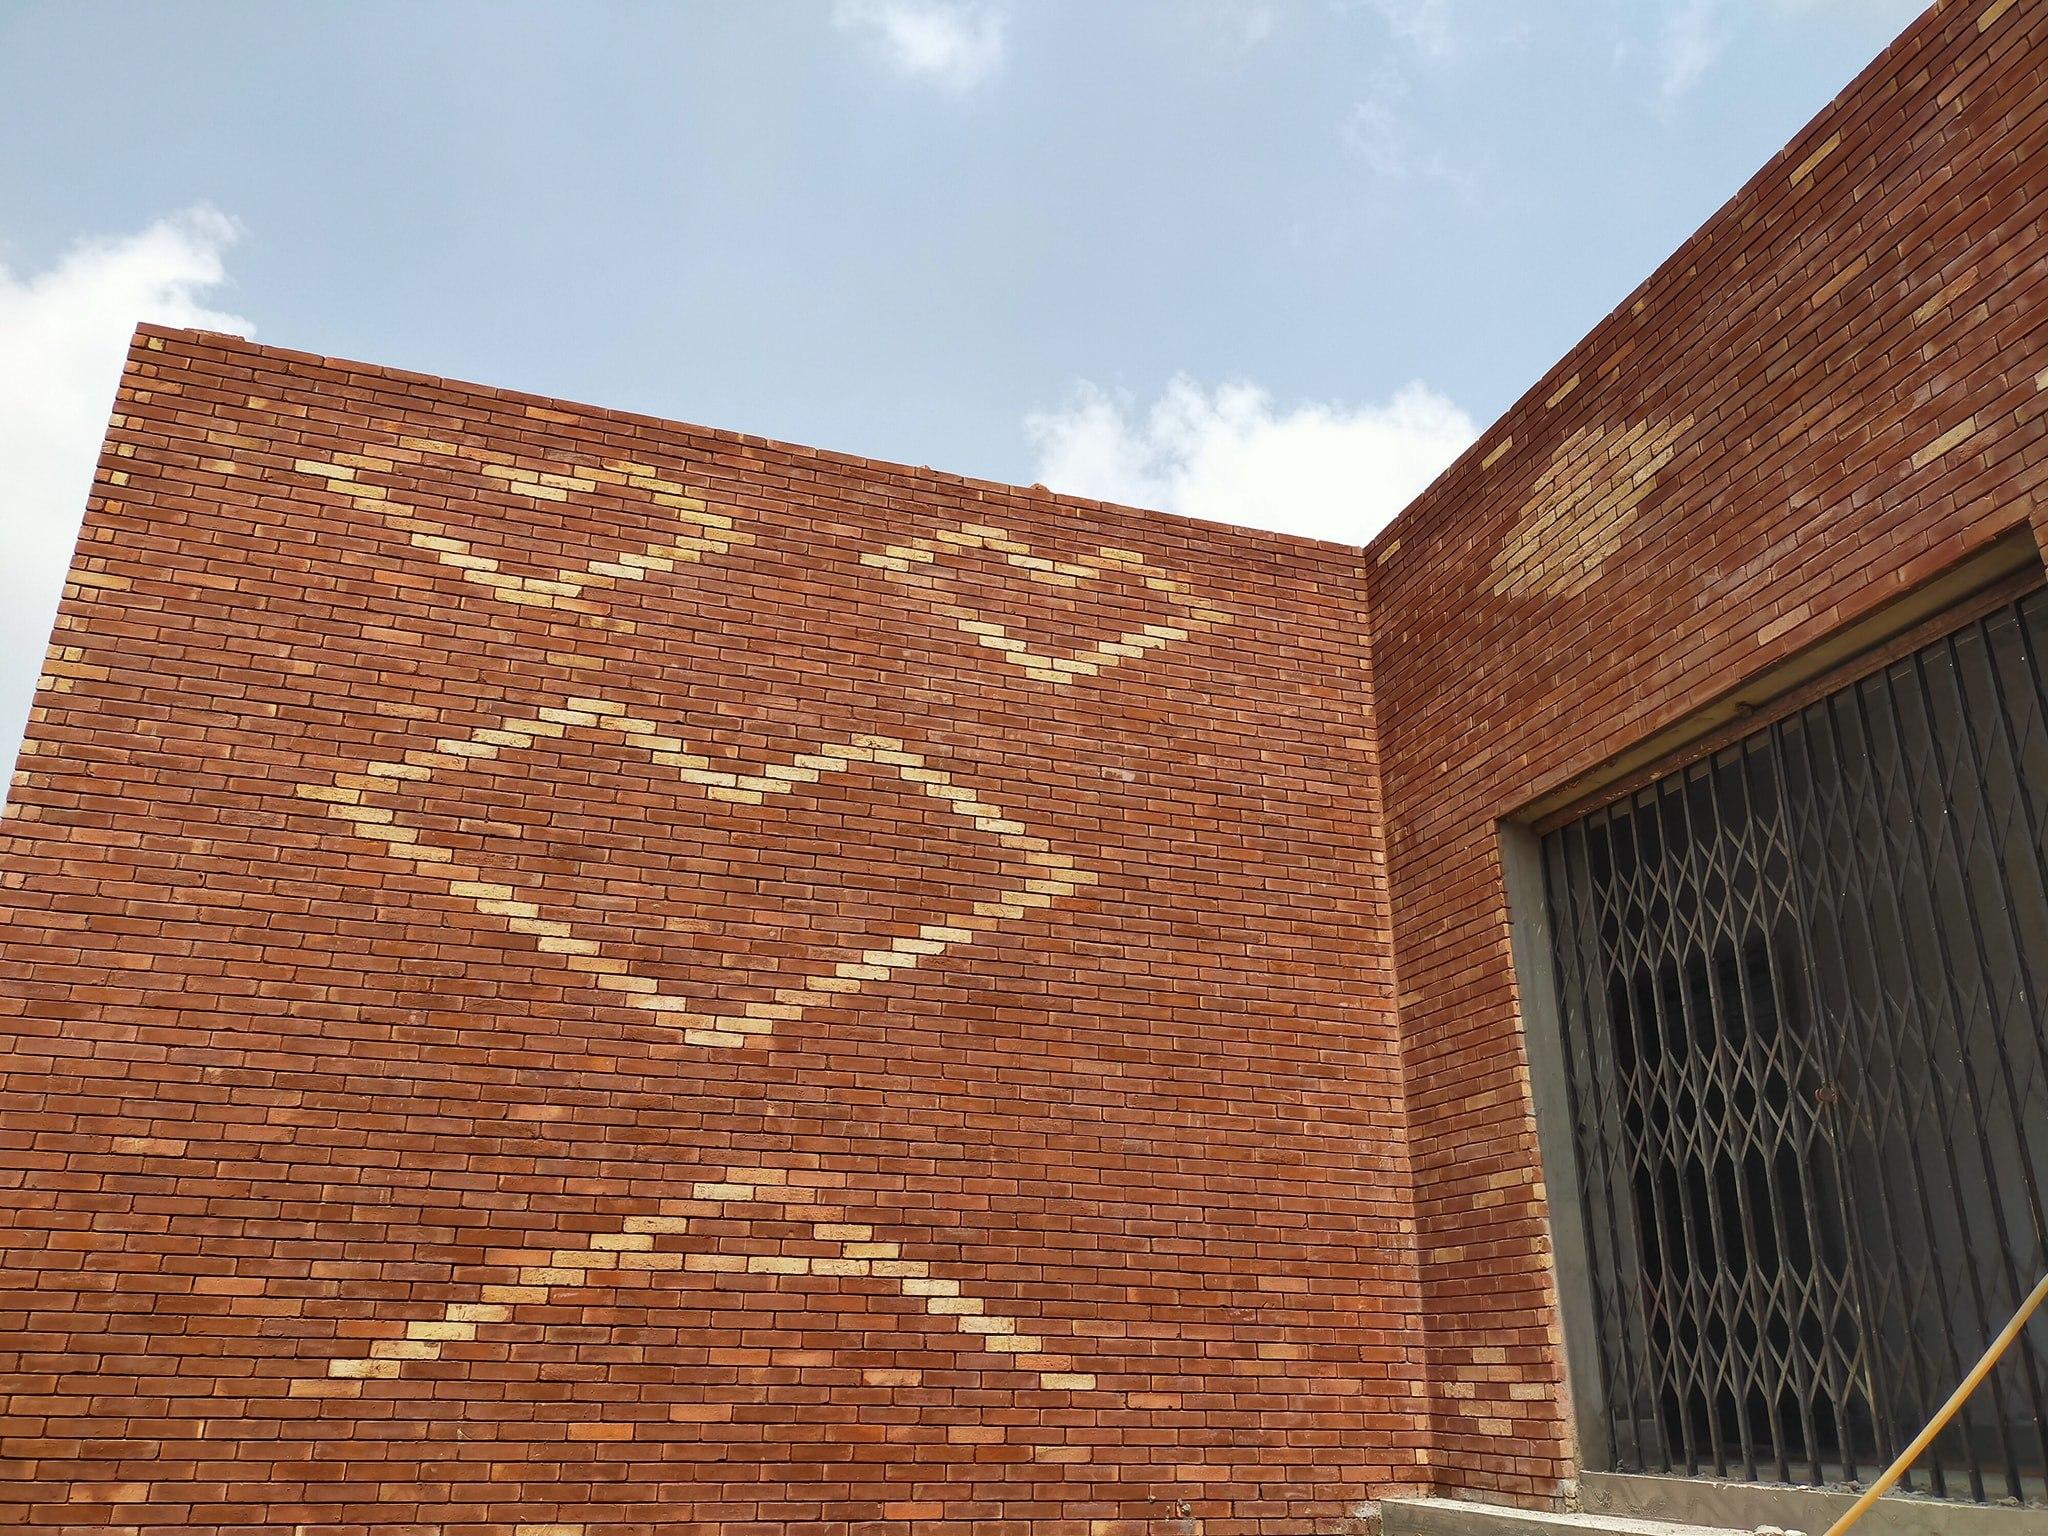 3 Red gutka brick tiles price in lahore pakistan